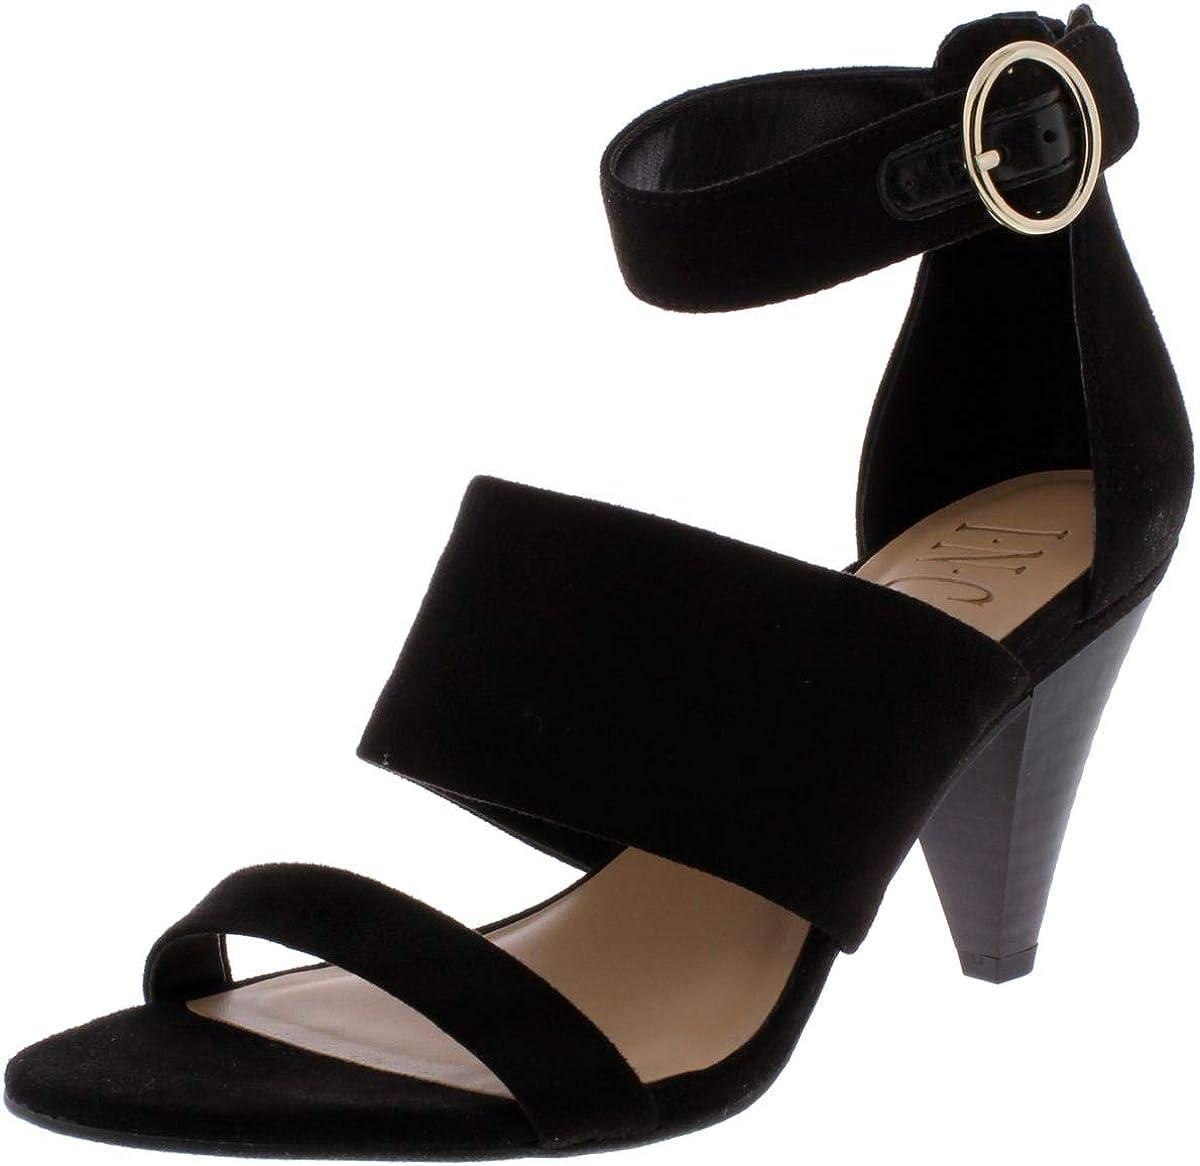 INC International Concepts Womens GAVI Open Toe Ankle Strap